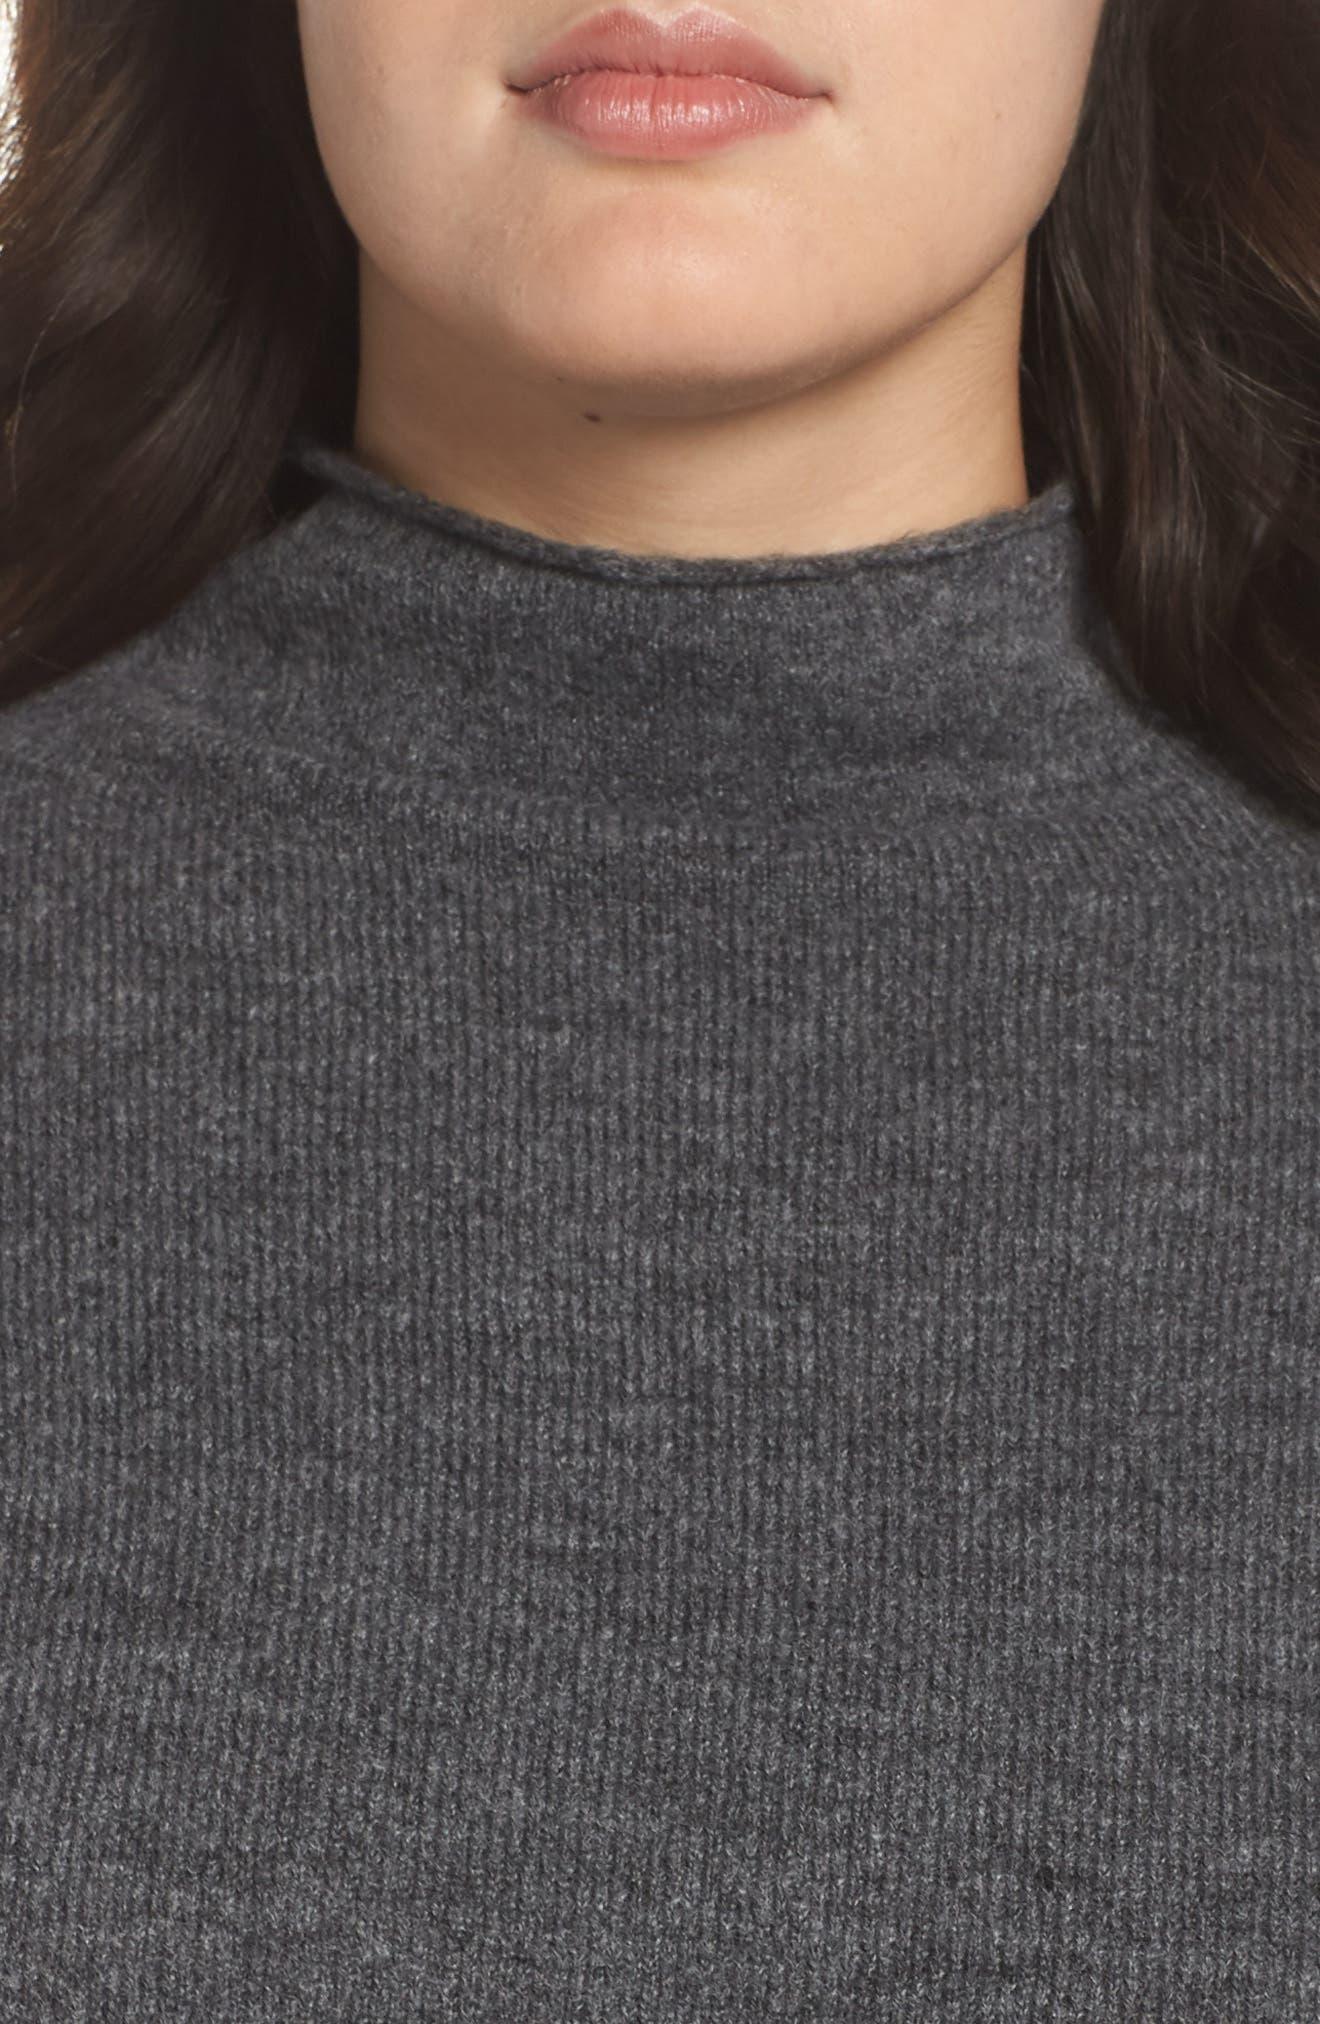 Cozy Mock Neck Sweater,                             Alternate thumbnail 9, color,                             GREY MEDIUM CHARCOAL HEATHER